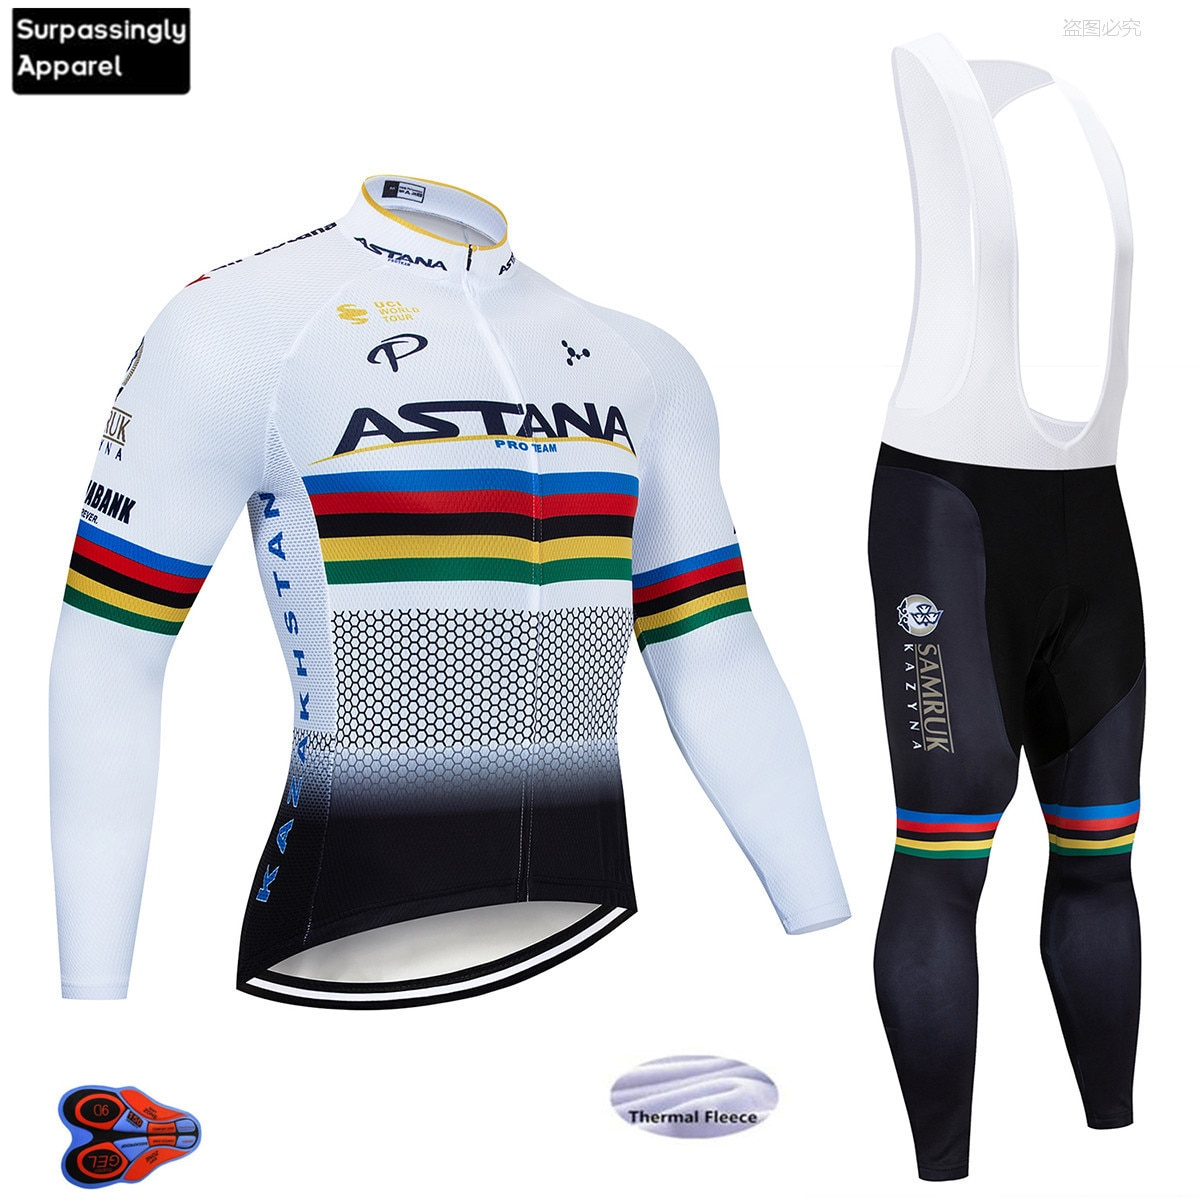 2019 astera de manga larga de Ciclismo Jersey pantalones de bicicleta conjunto de almohadillas 9D para hombre Ropa Ciclismo Pro térmico Ciclismo Maillot Culotte